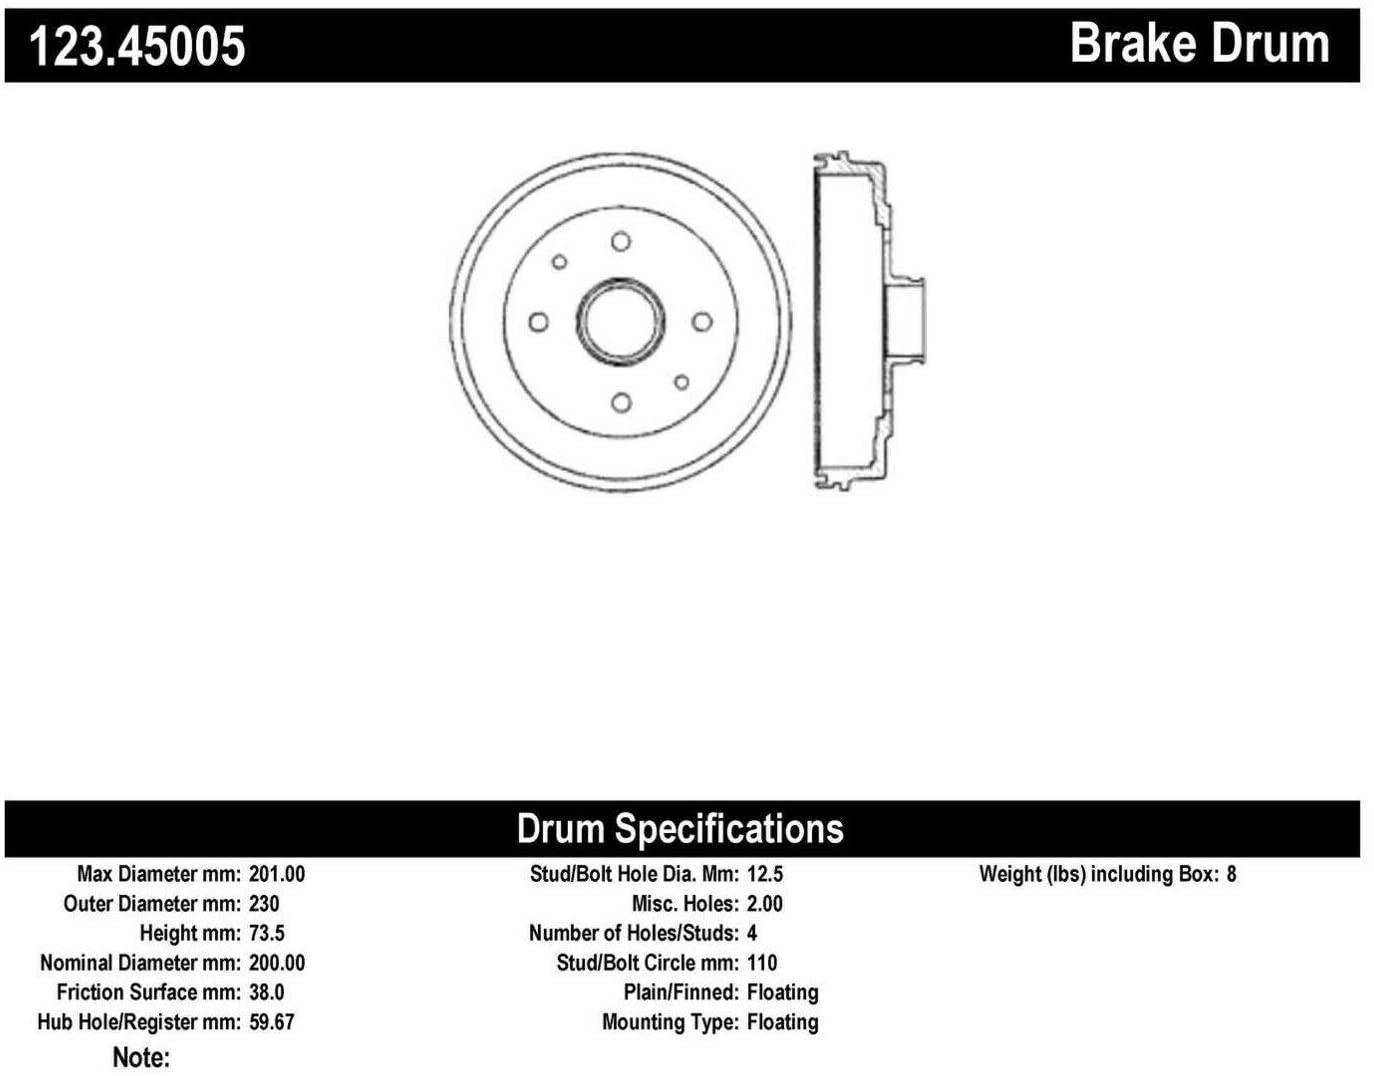 Centric Parts 123.45005 Brake Drum